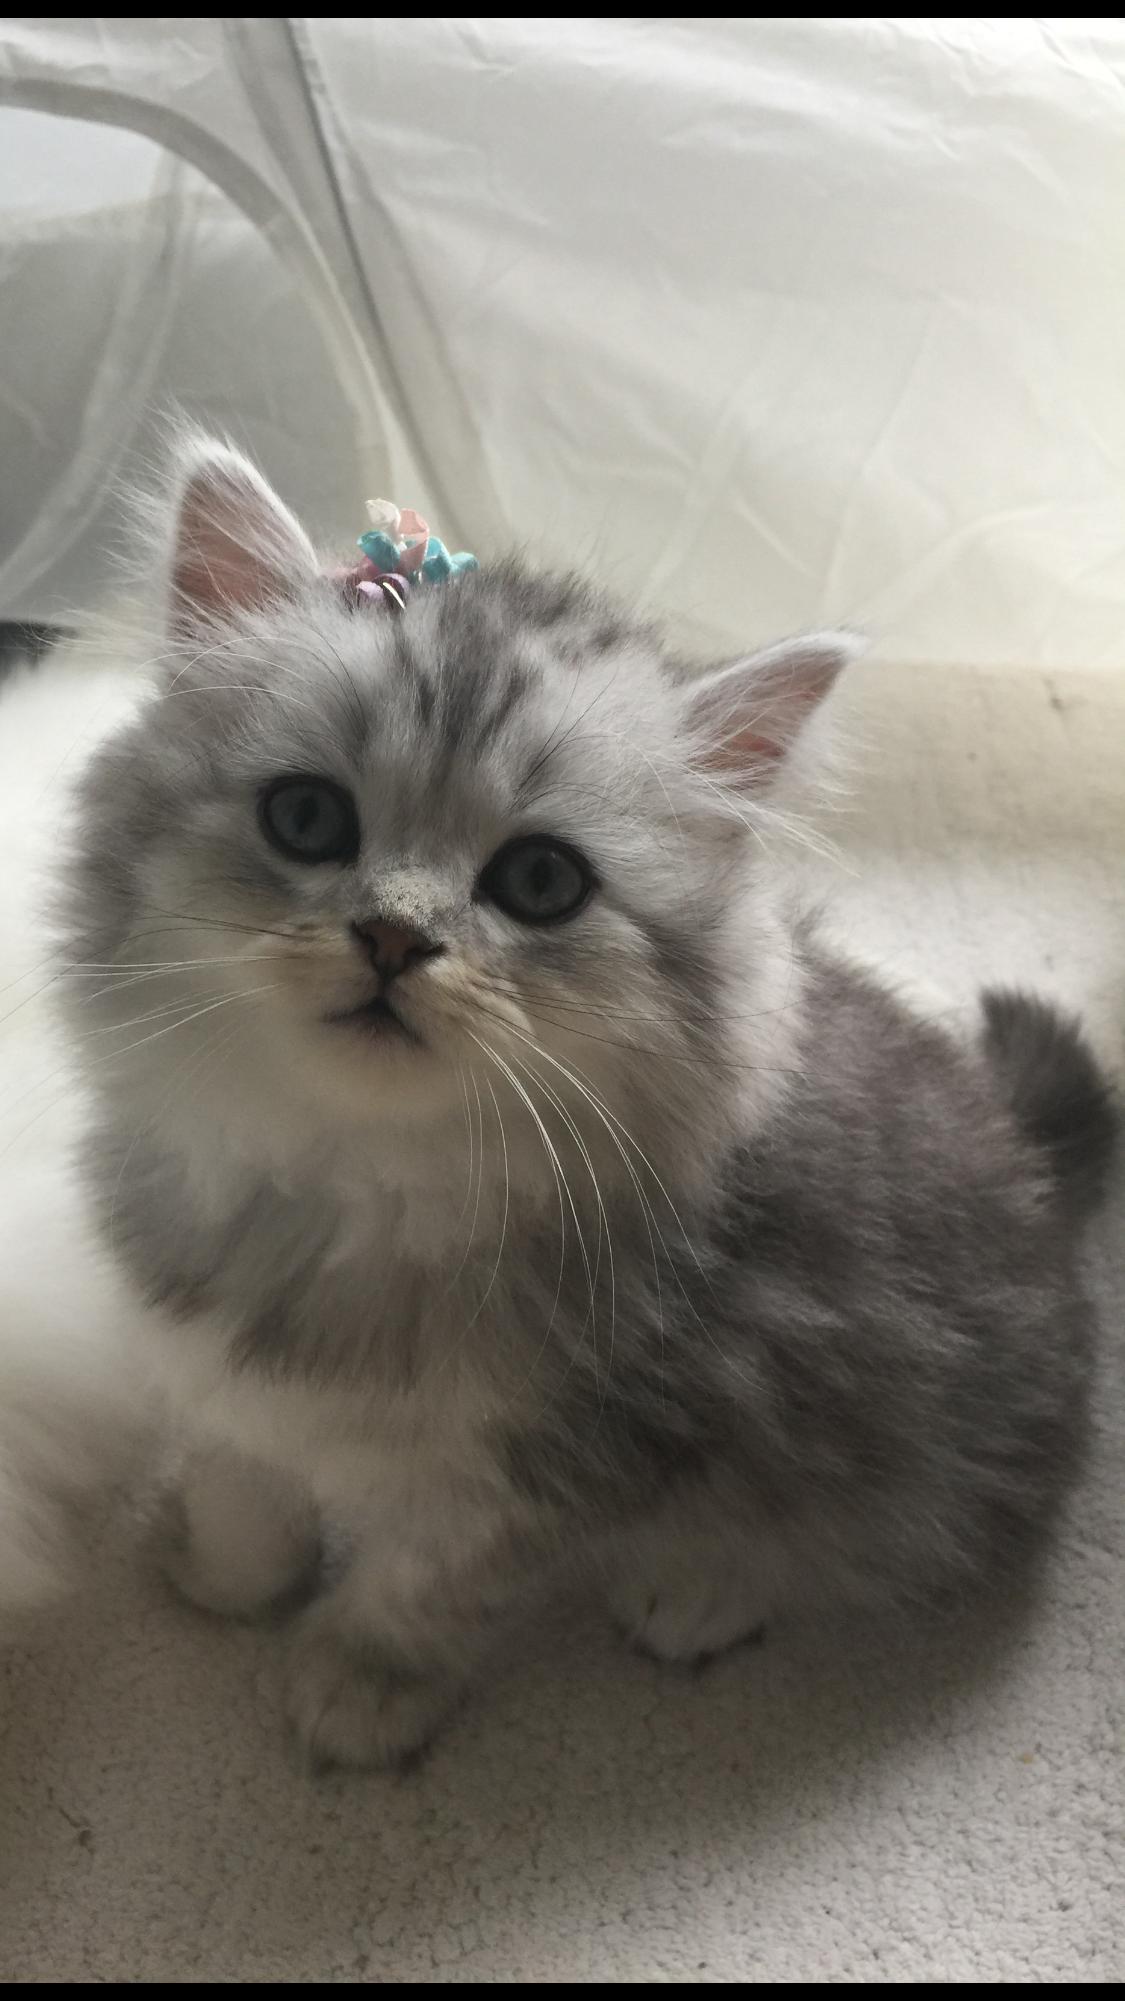 Pin By Belinda De Lange On Beautiful Kitten Persian And Chinchilla Kittens Cutest Beautiful Kittens Cute Cats